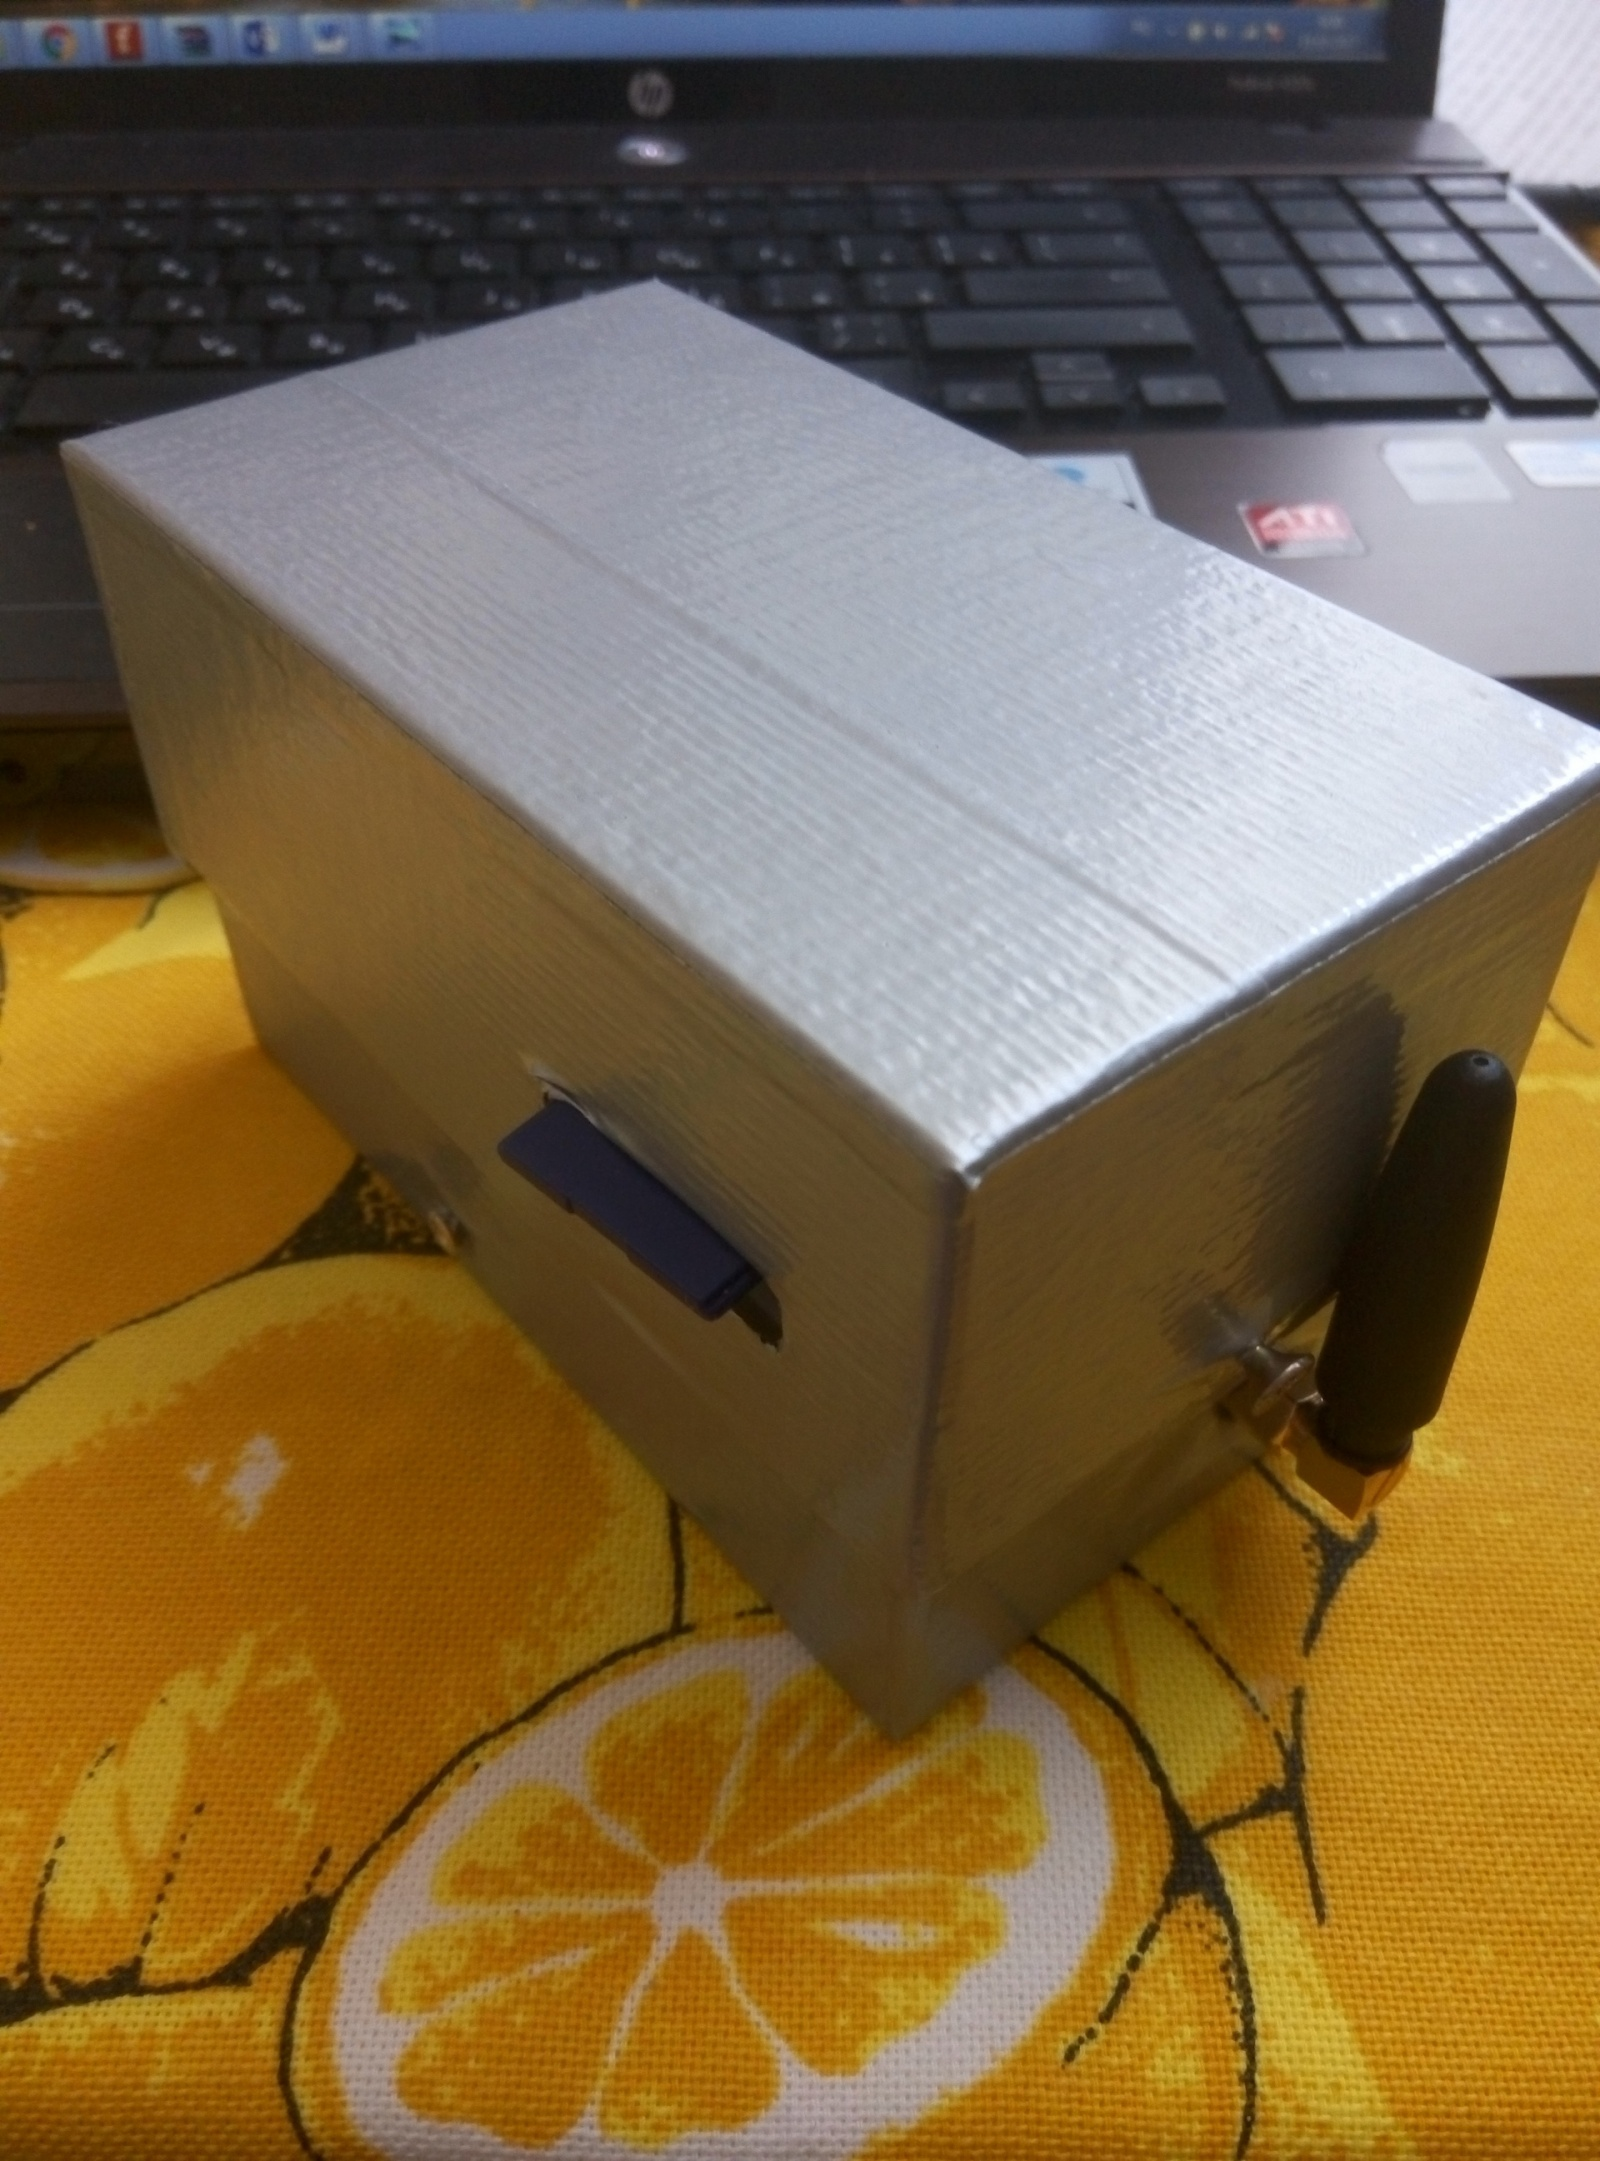 GSM-сигнализация для автомобиля на базе Arduino Uno - 17